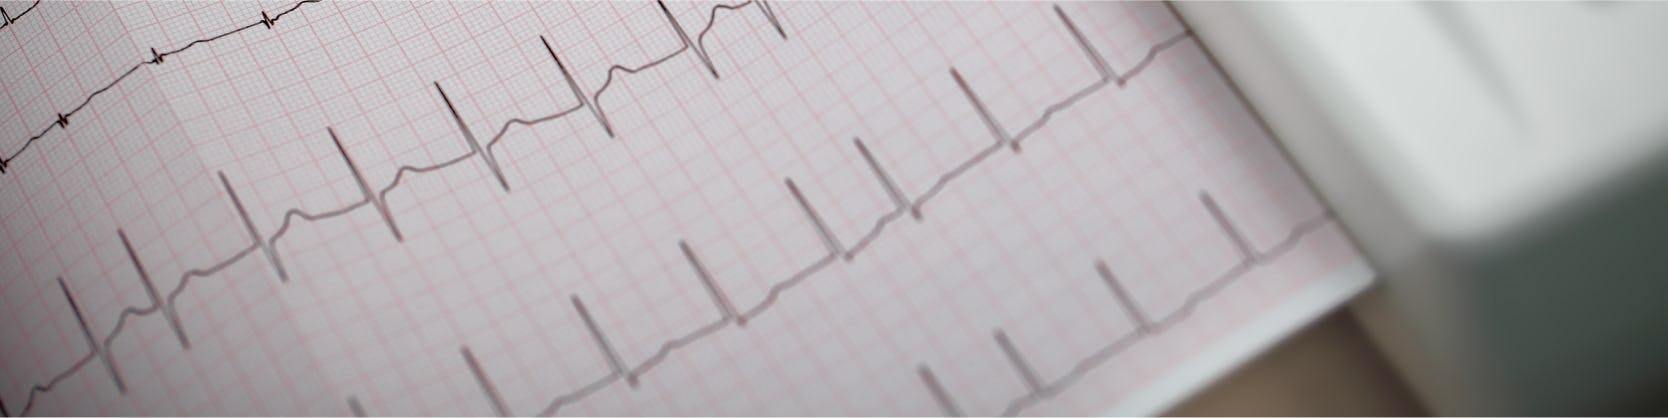 Electrocardiografie - ECG / EKG  | Centrele Ares | Inovatie in Cardiologie